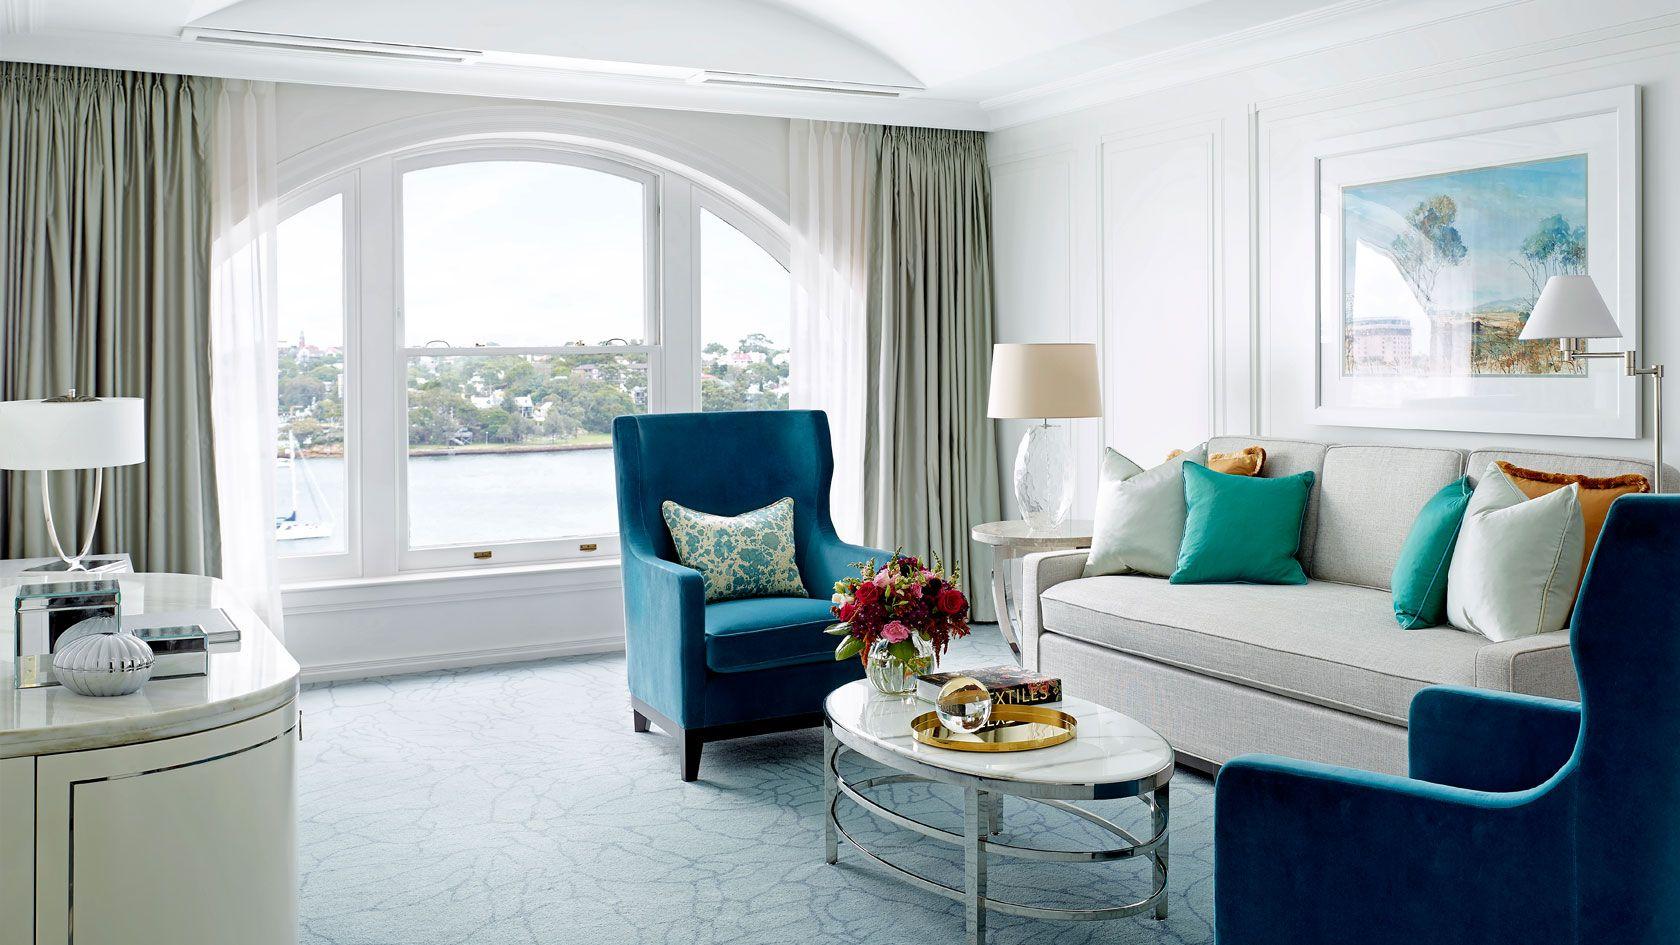 Gallery Sydney Luxury Hotel The Langham, Sydney